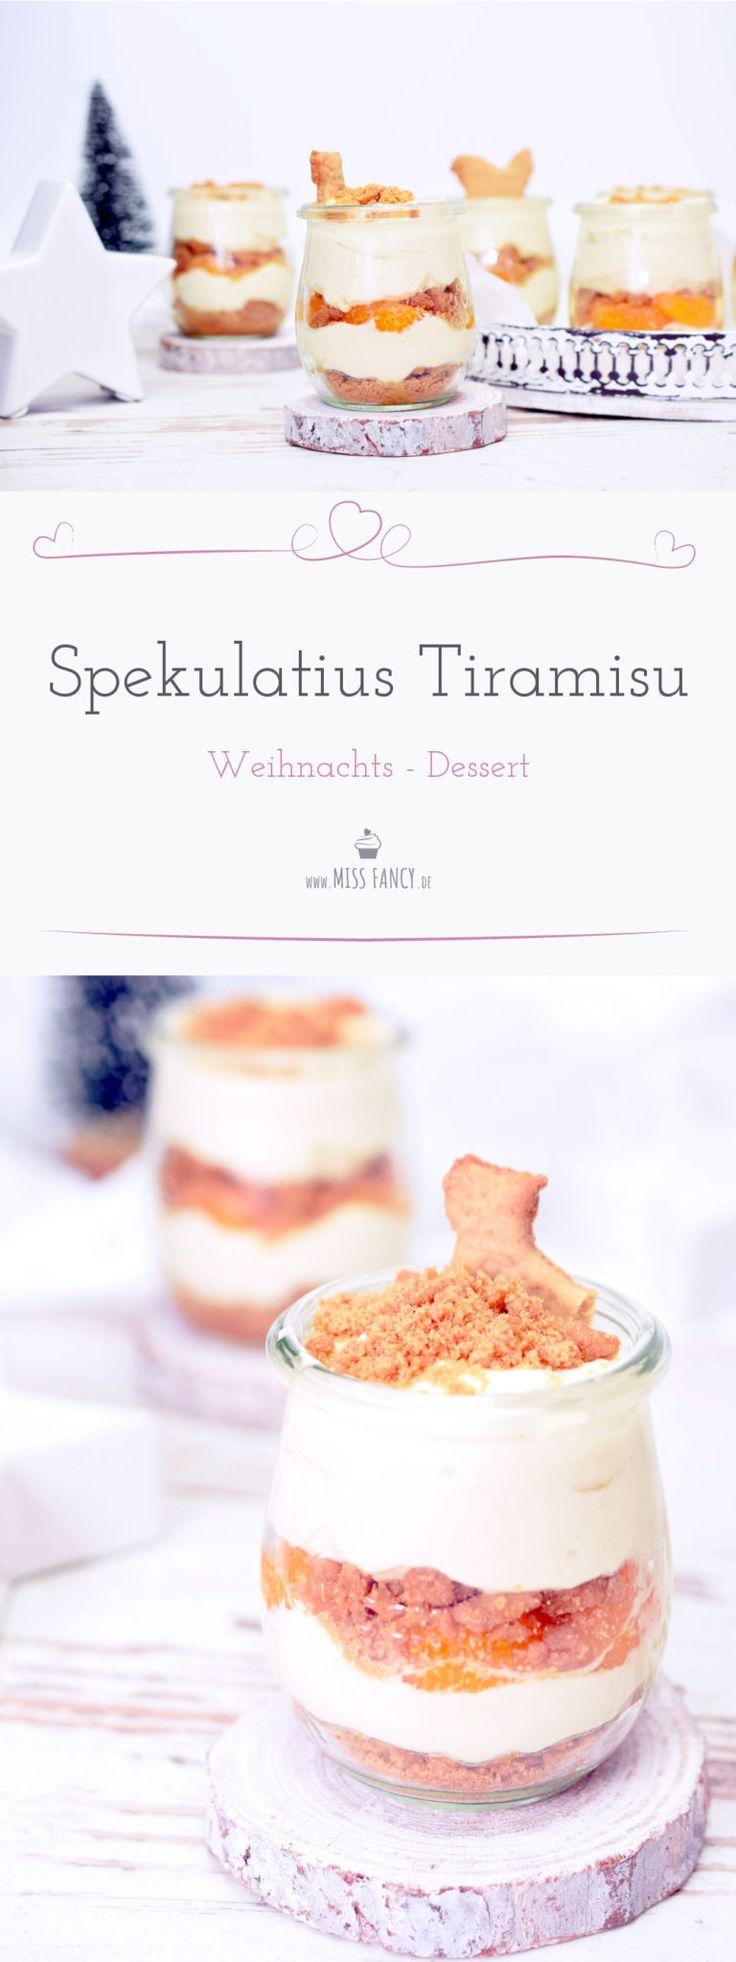 Spekulatius Tiramisu mit Mandarinen – Ilse